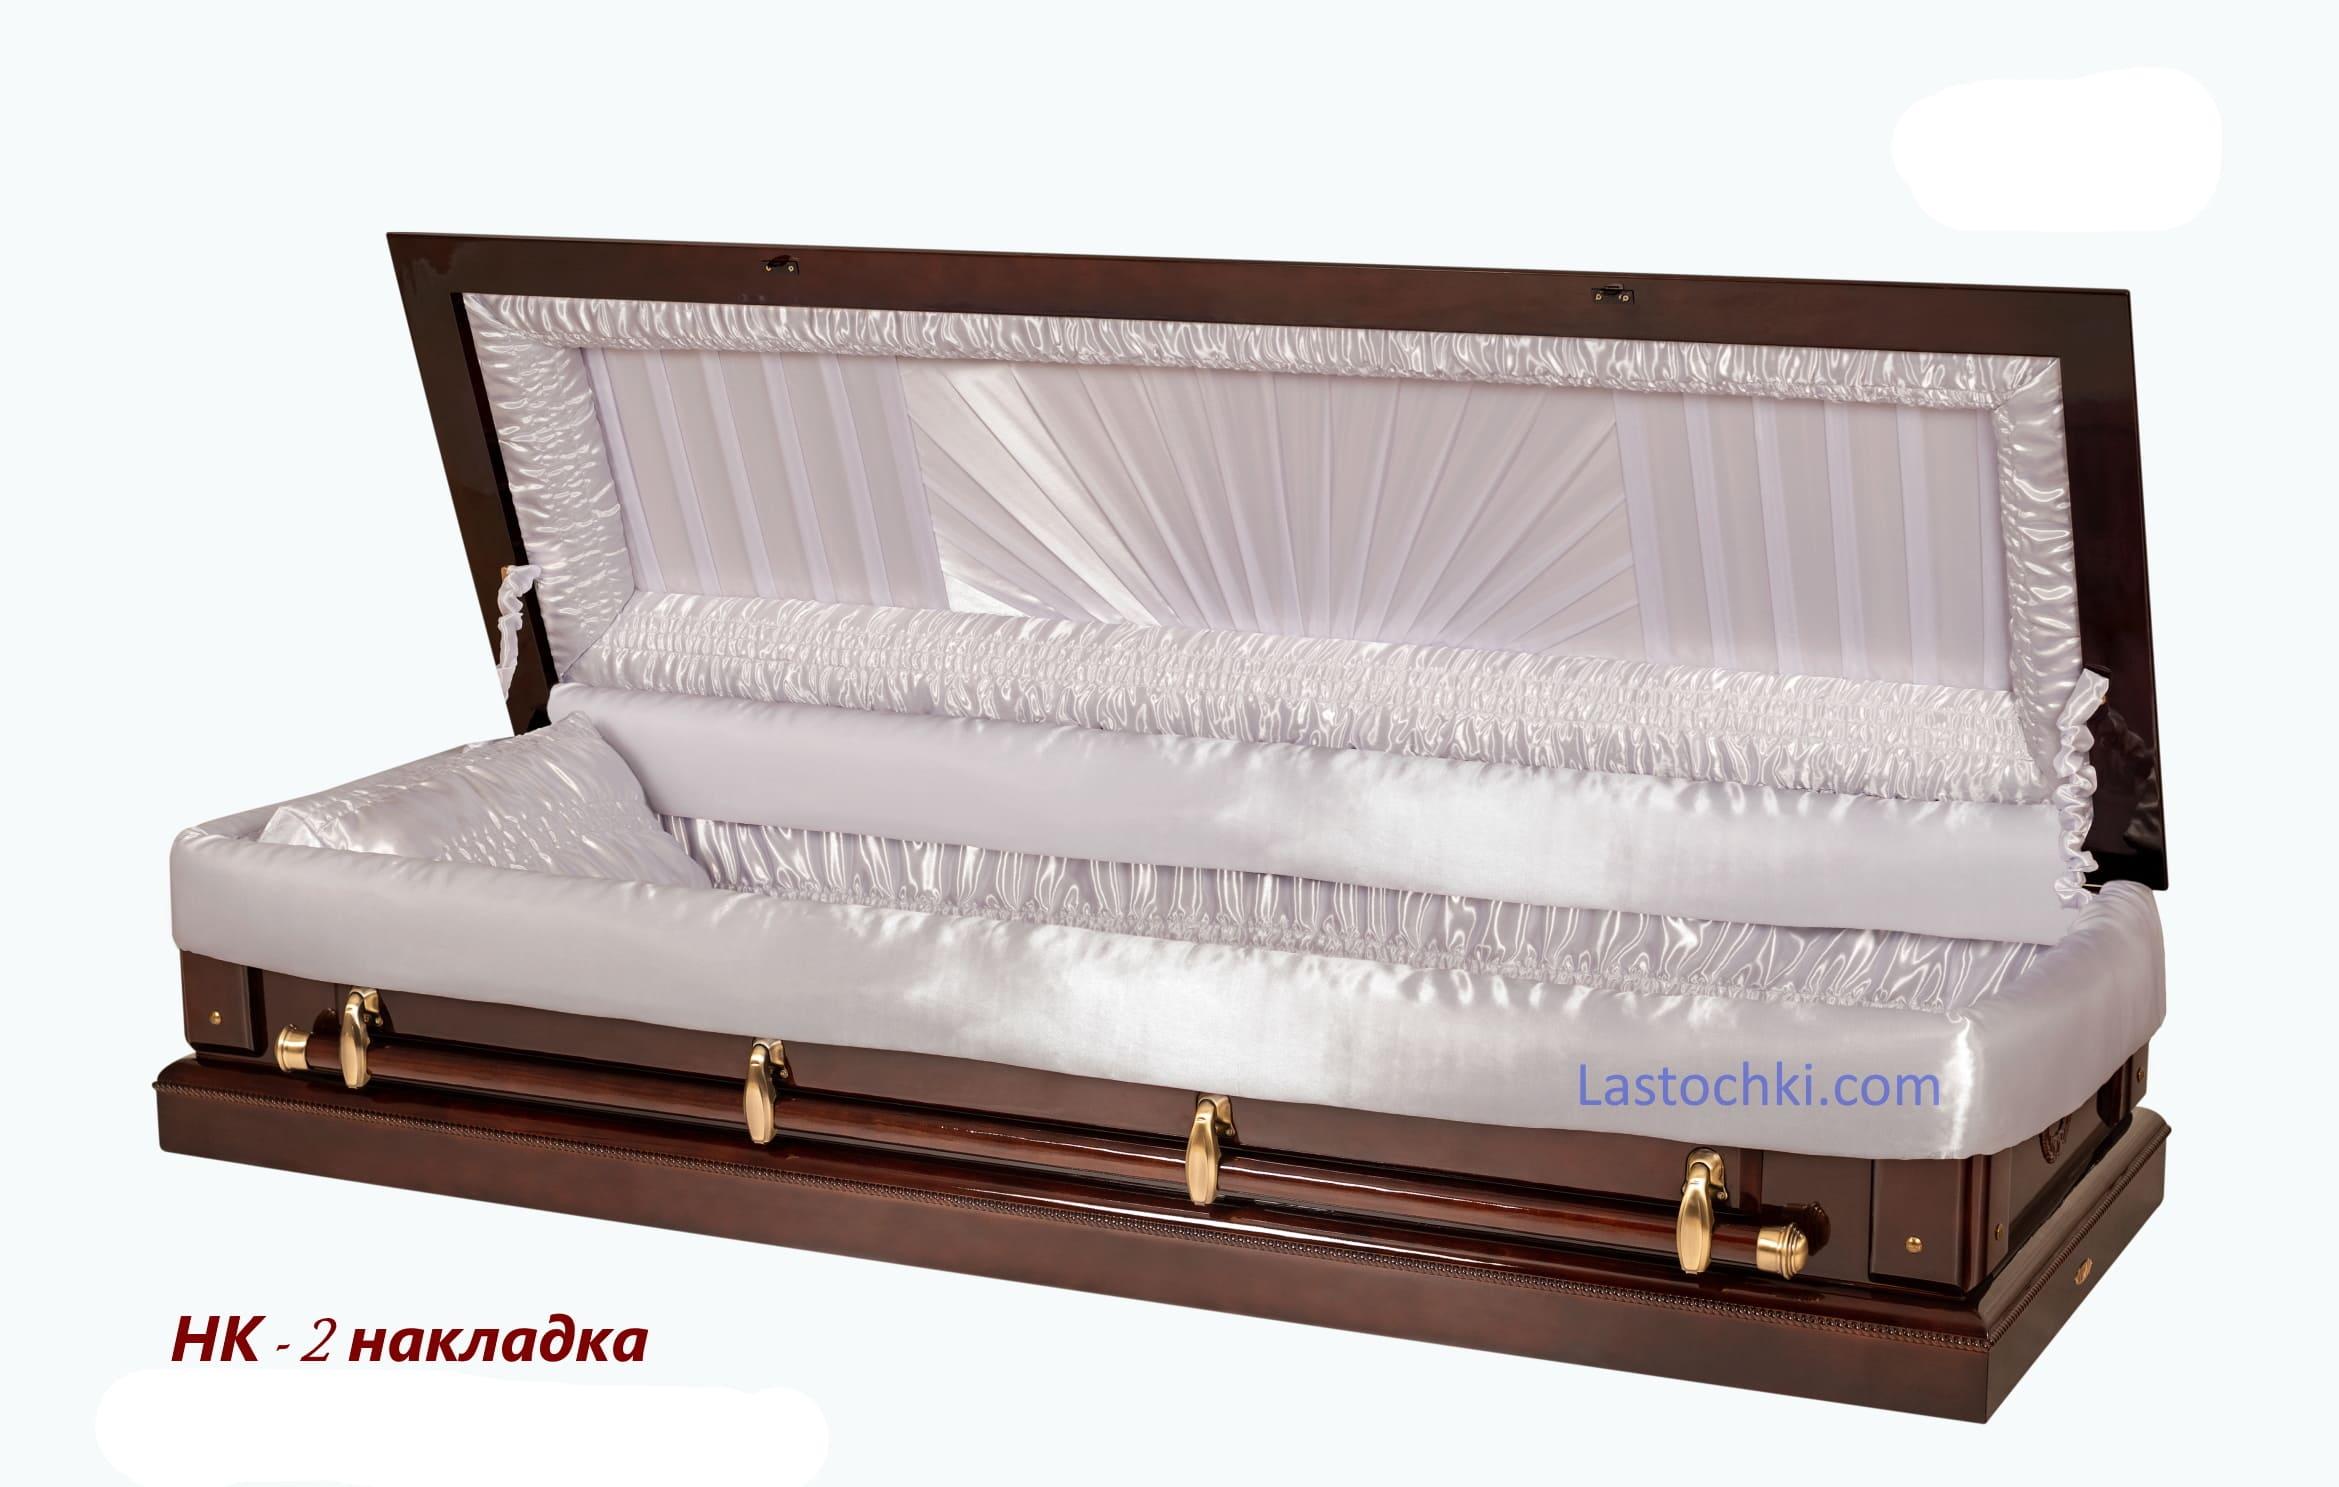 Саркофаг НК - 2 накладка - Цена 33 000 грн.